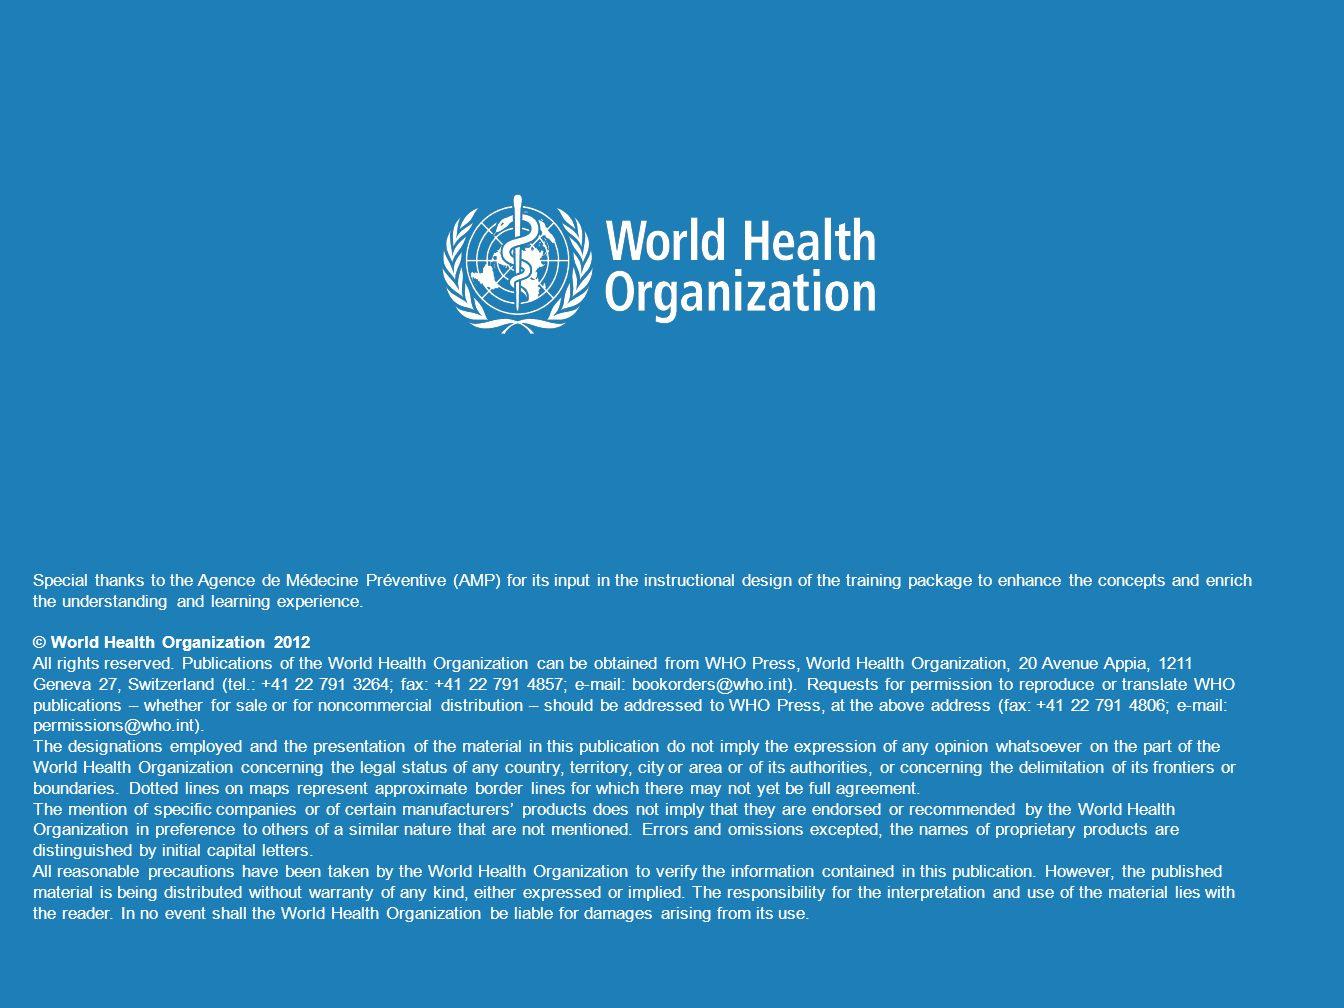 © World Health Organization 2012